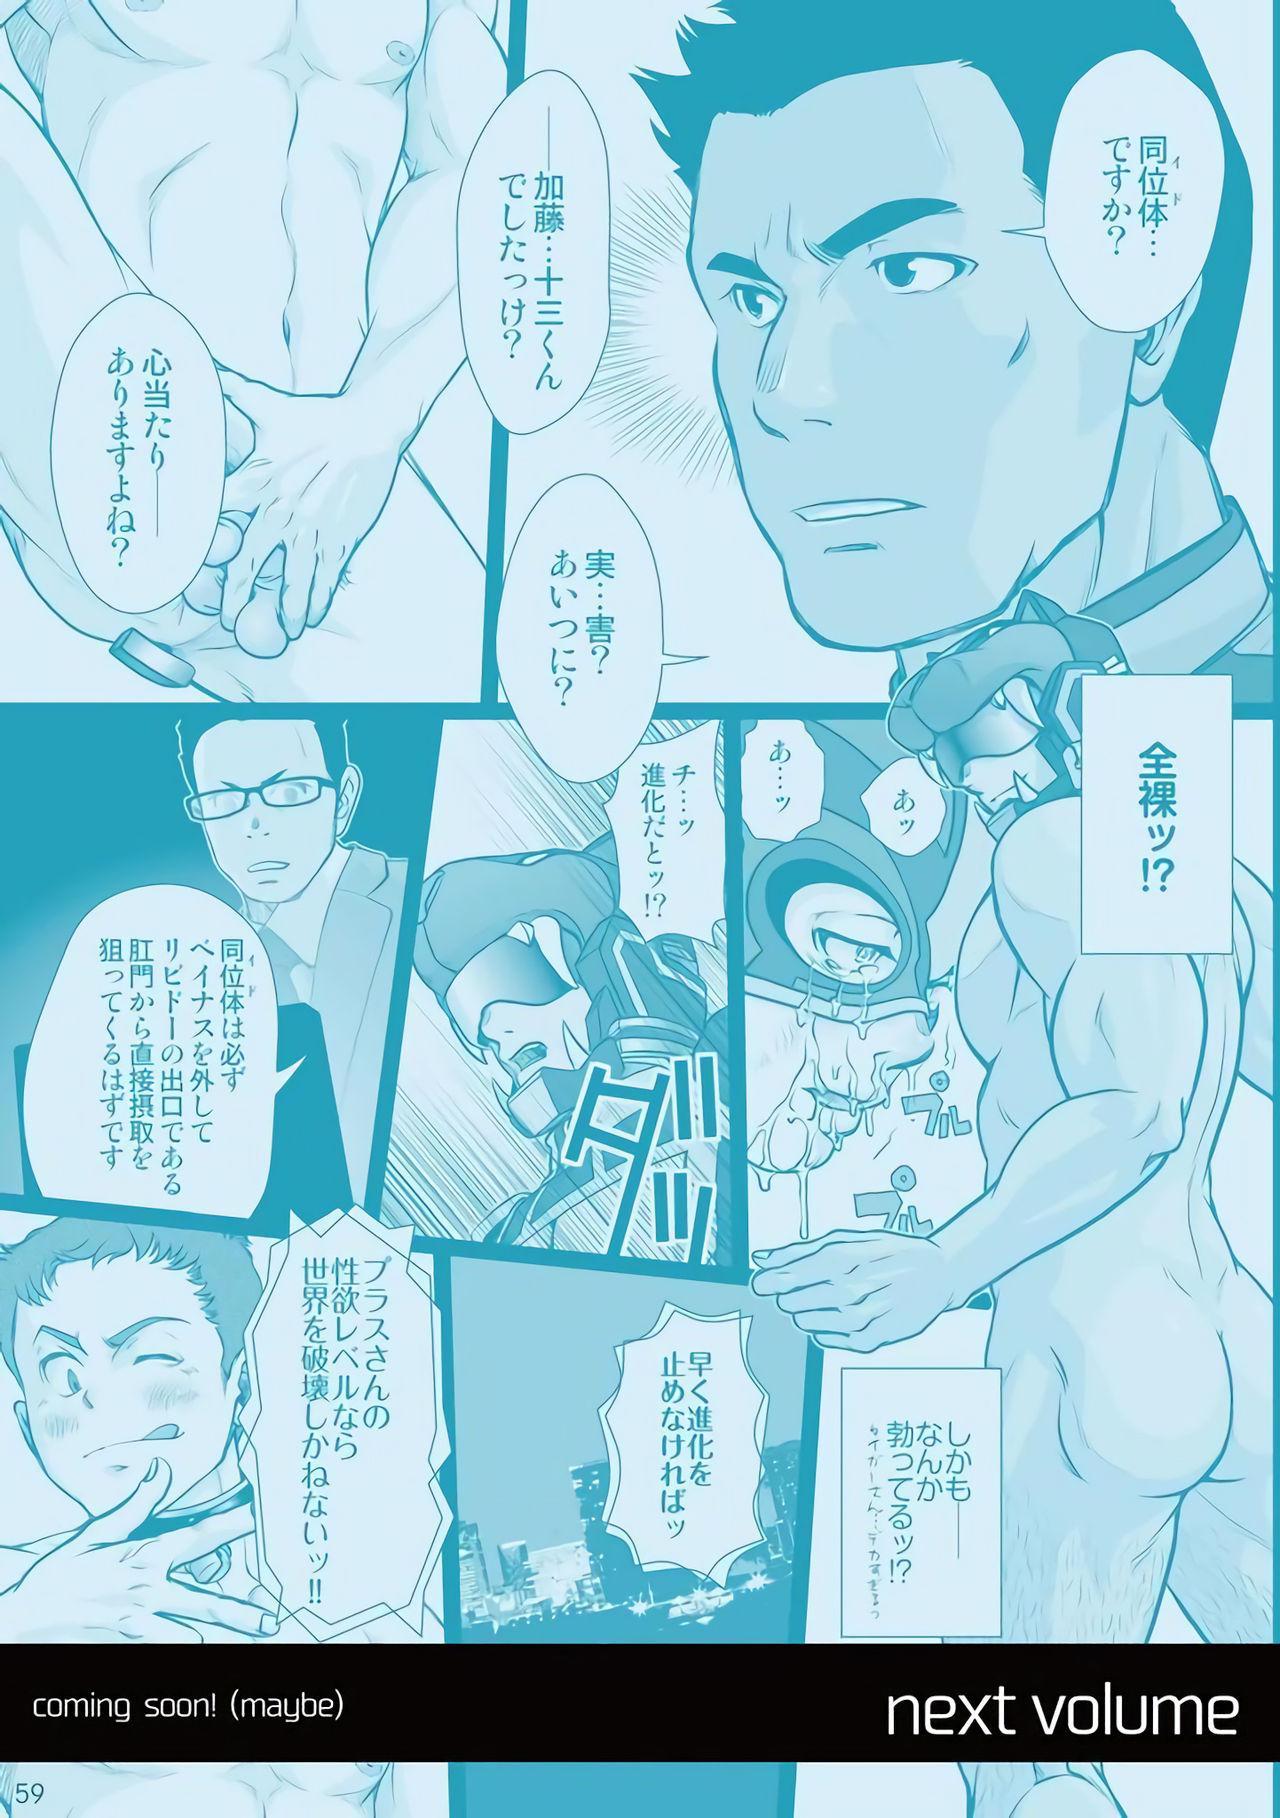 [Pagumiee (Kenta)] Tatakae!+++ (Plus-san)!! [English] [N04h] [Digital] 60